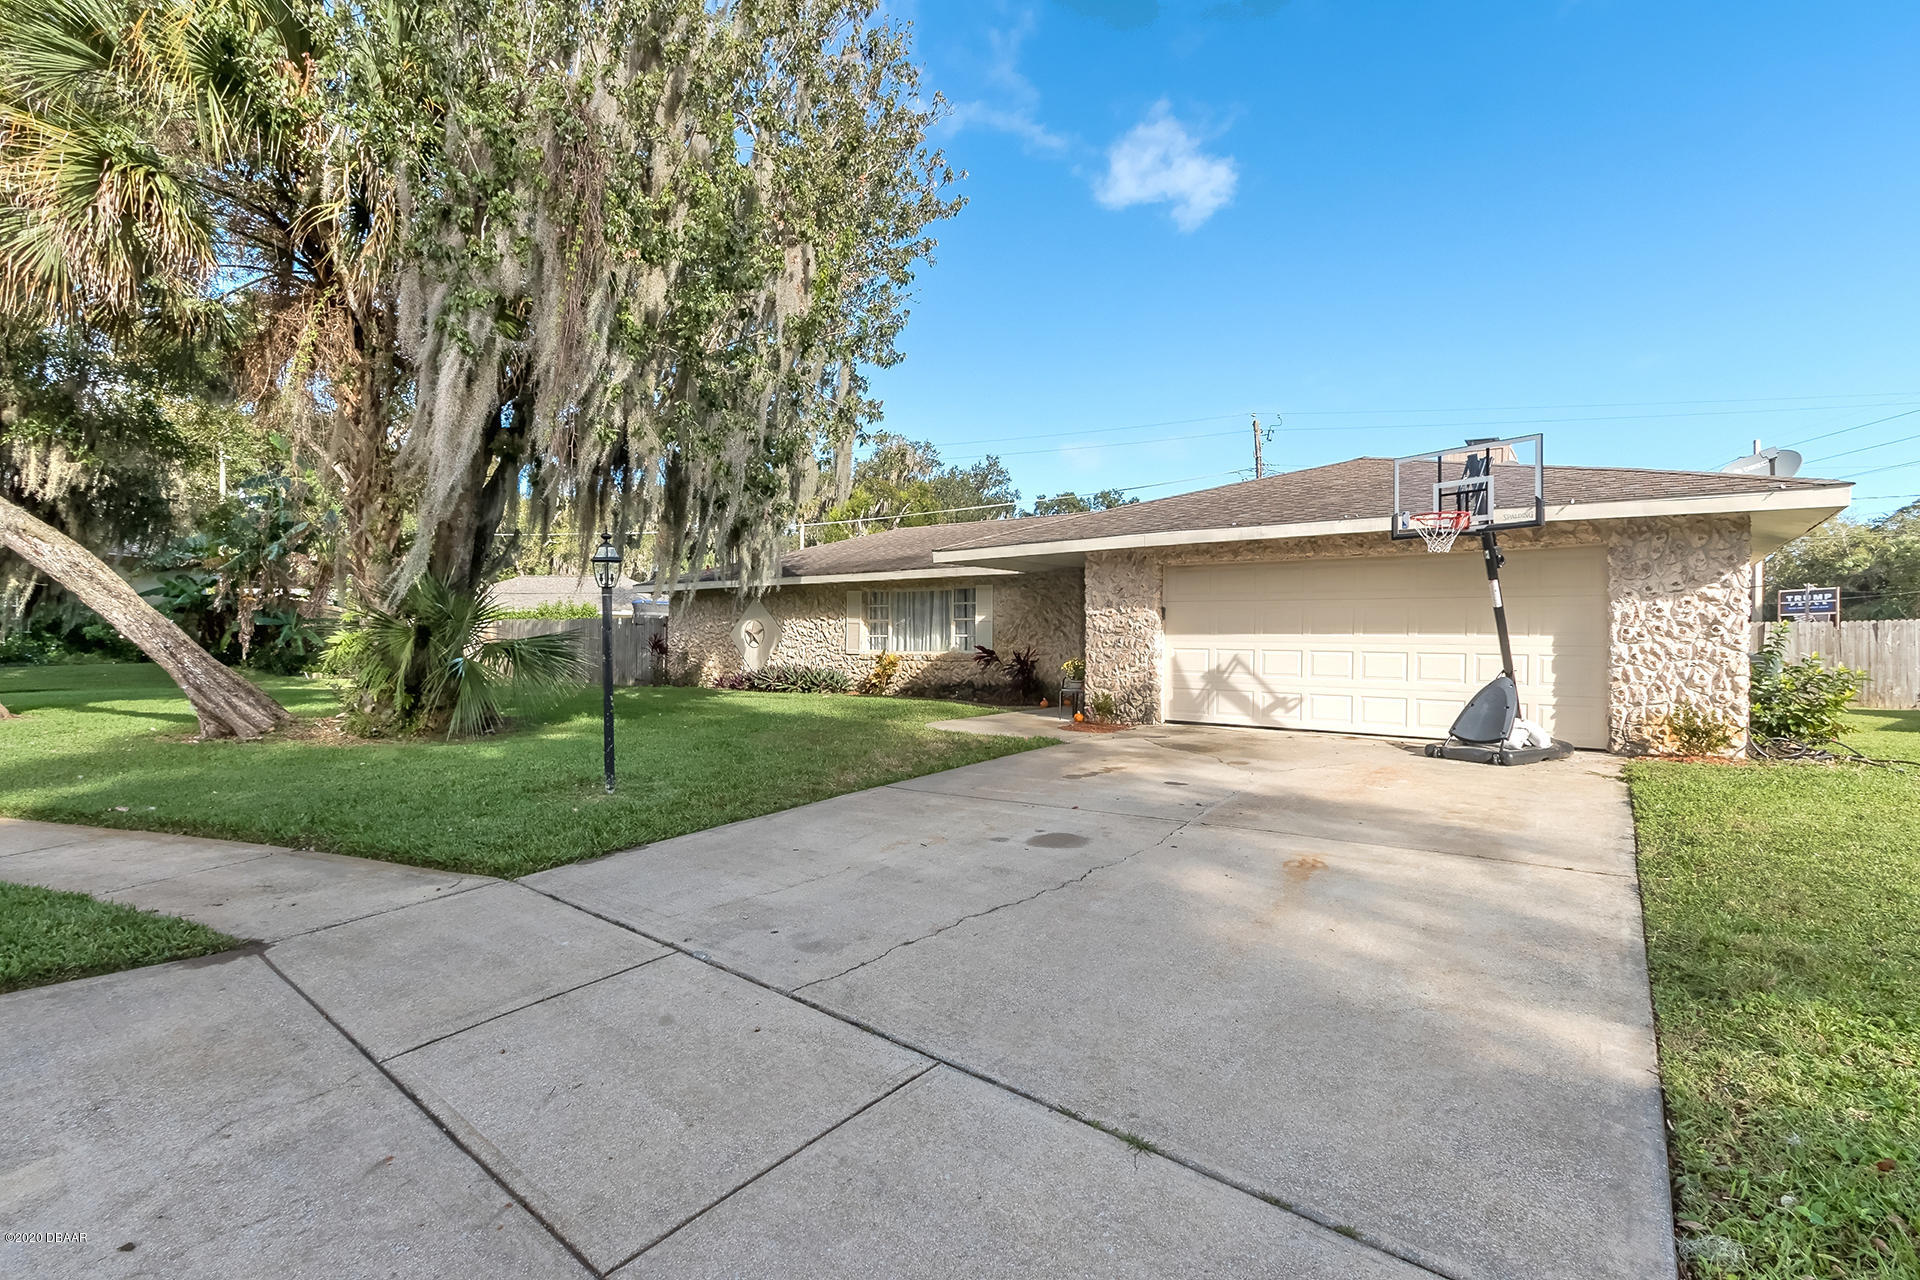 Photo of 528 Hamlet Drive, Port Orange, FL 32127